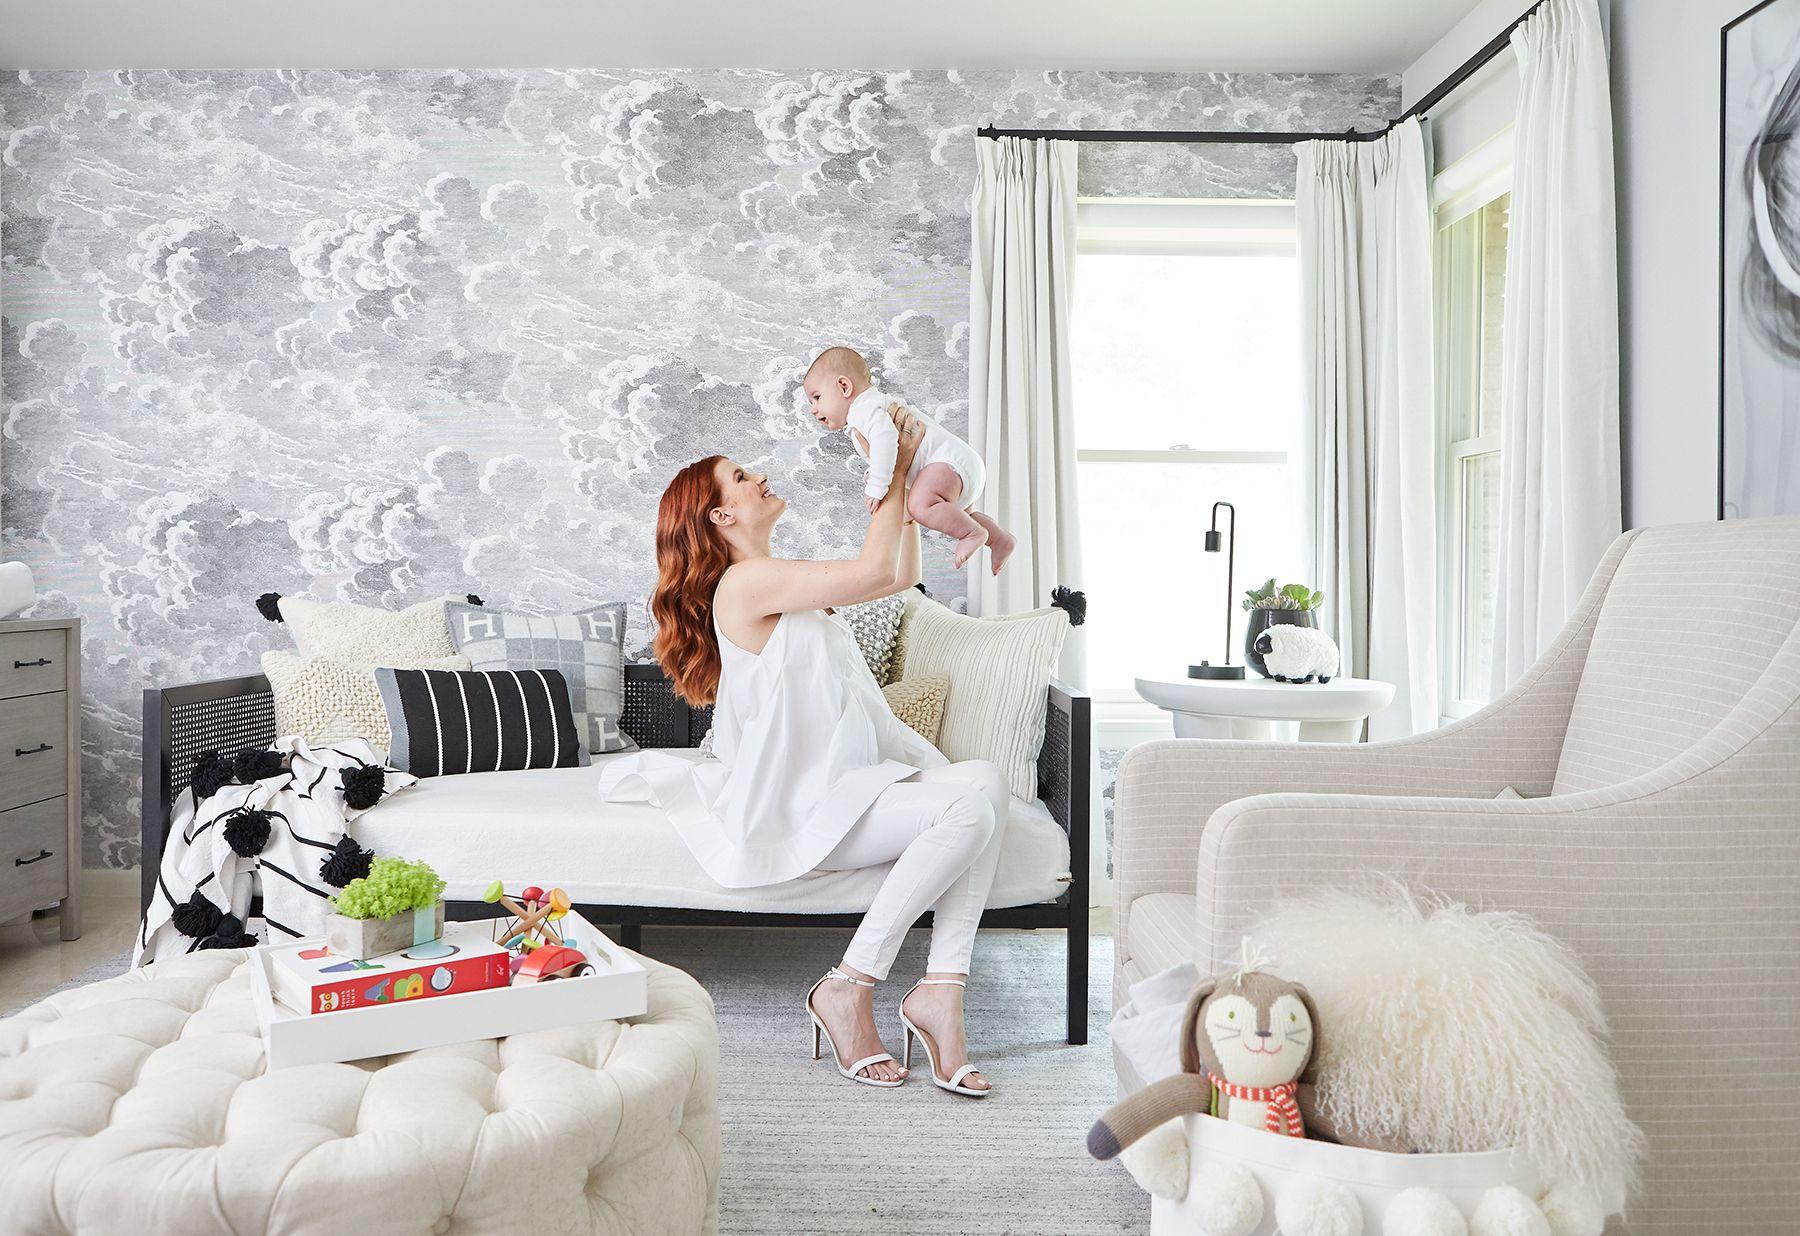 Rewardstyle S Amber Venz Box Dallas Nursery D Magazine